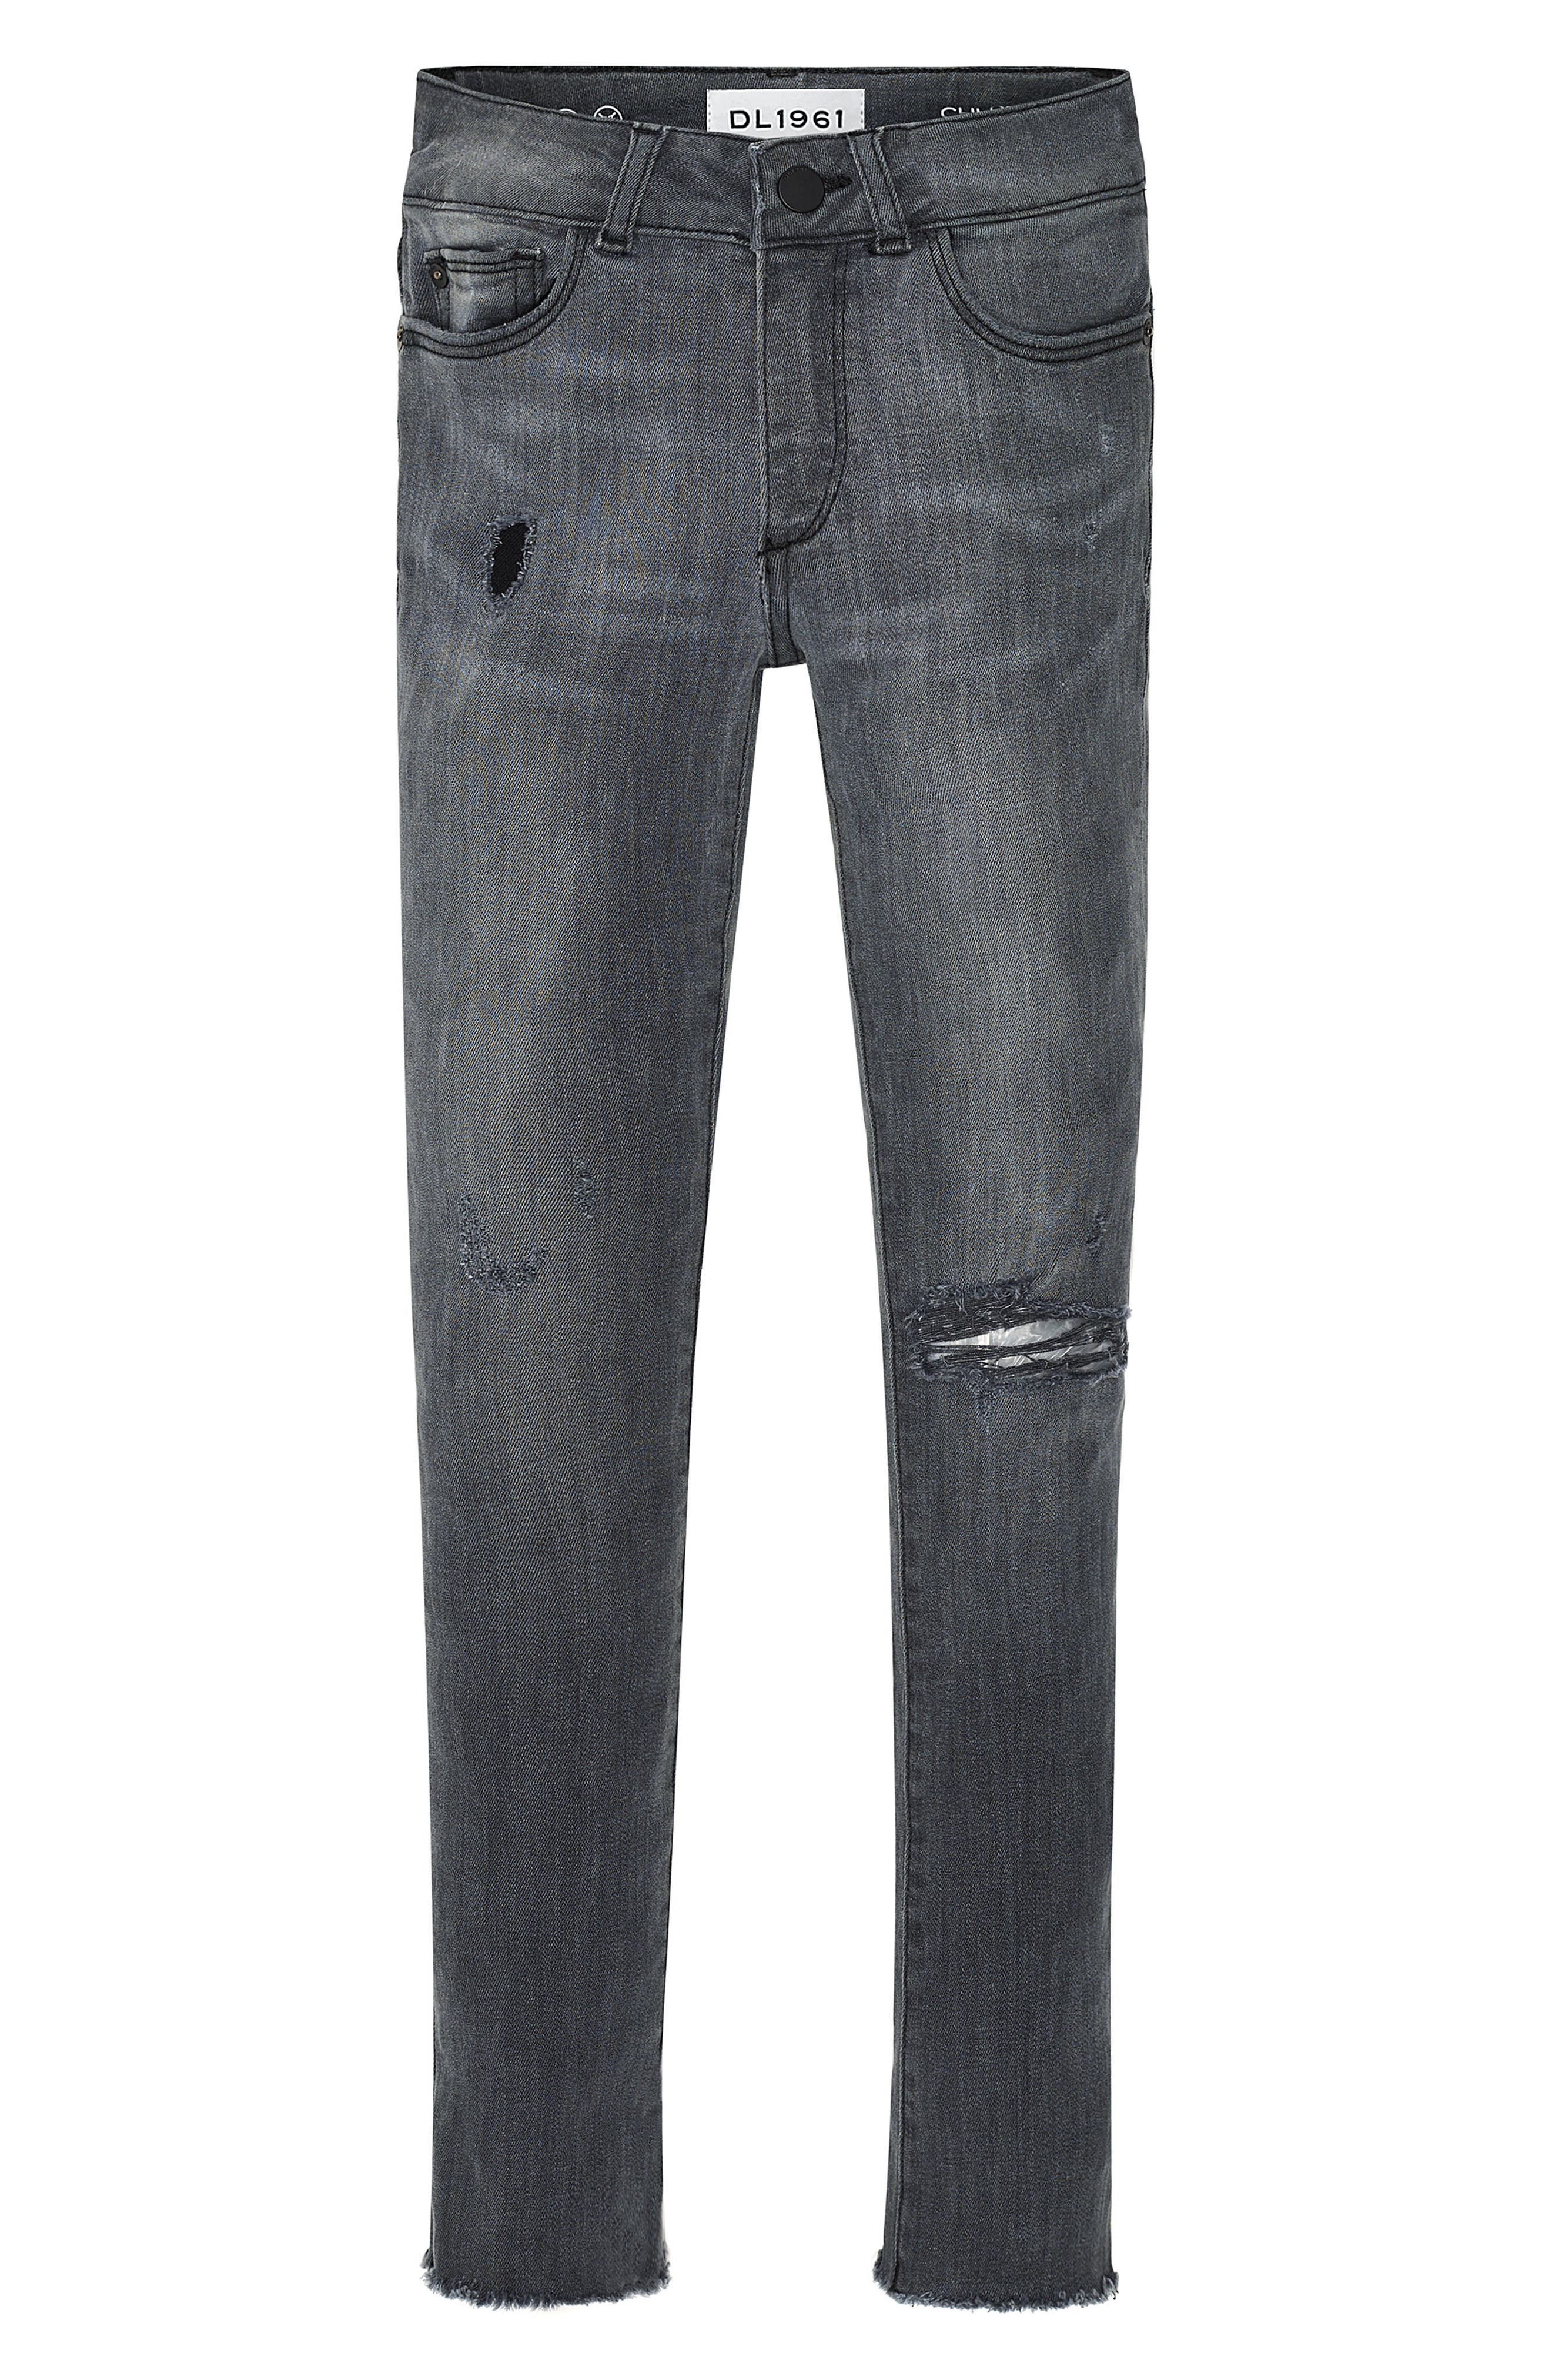 Chloe Raw Hem Skinny Jeans,                         Main,                         color, Sierra